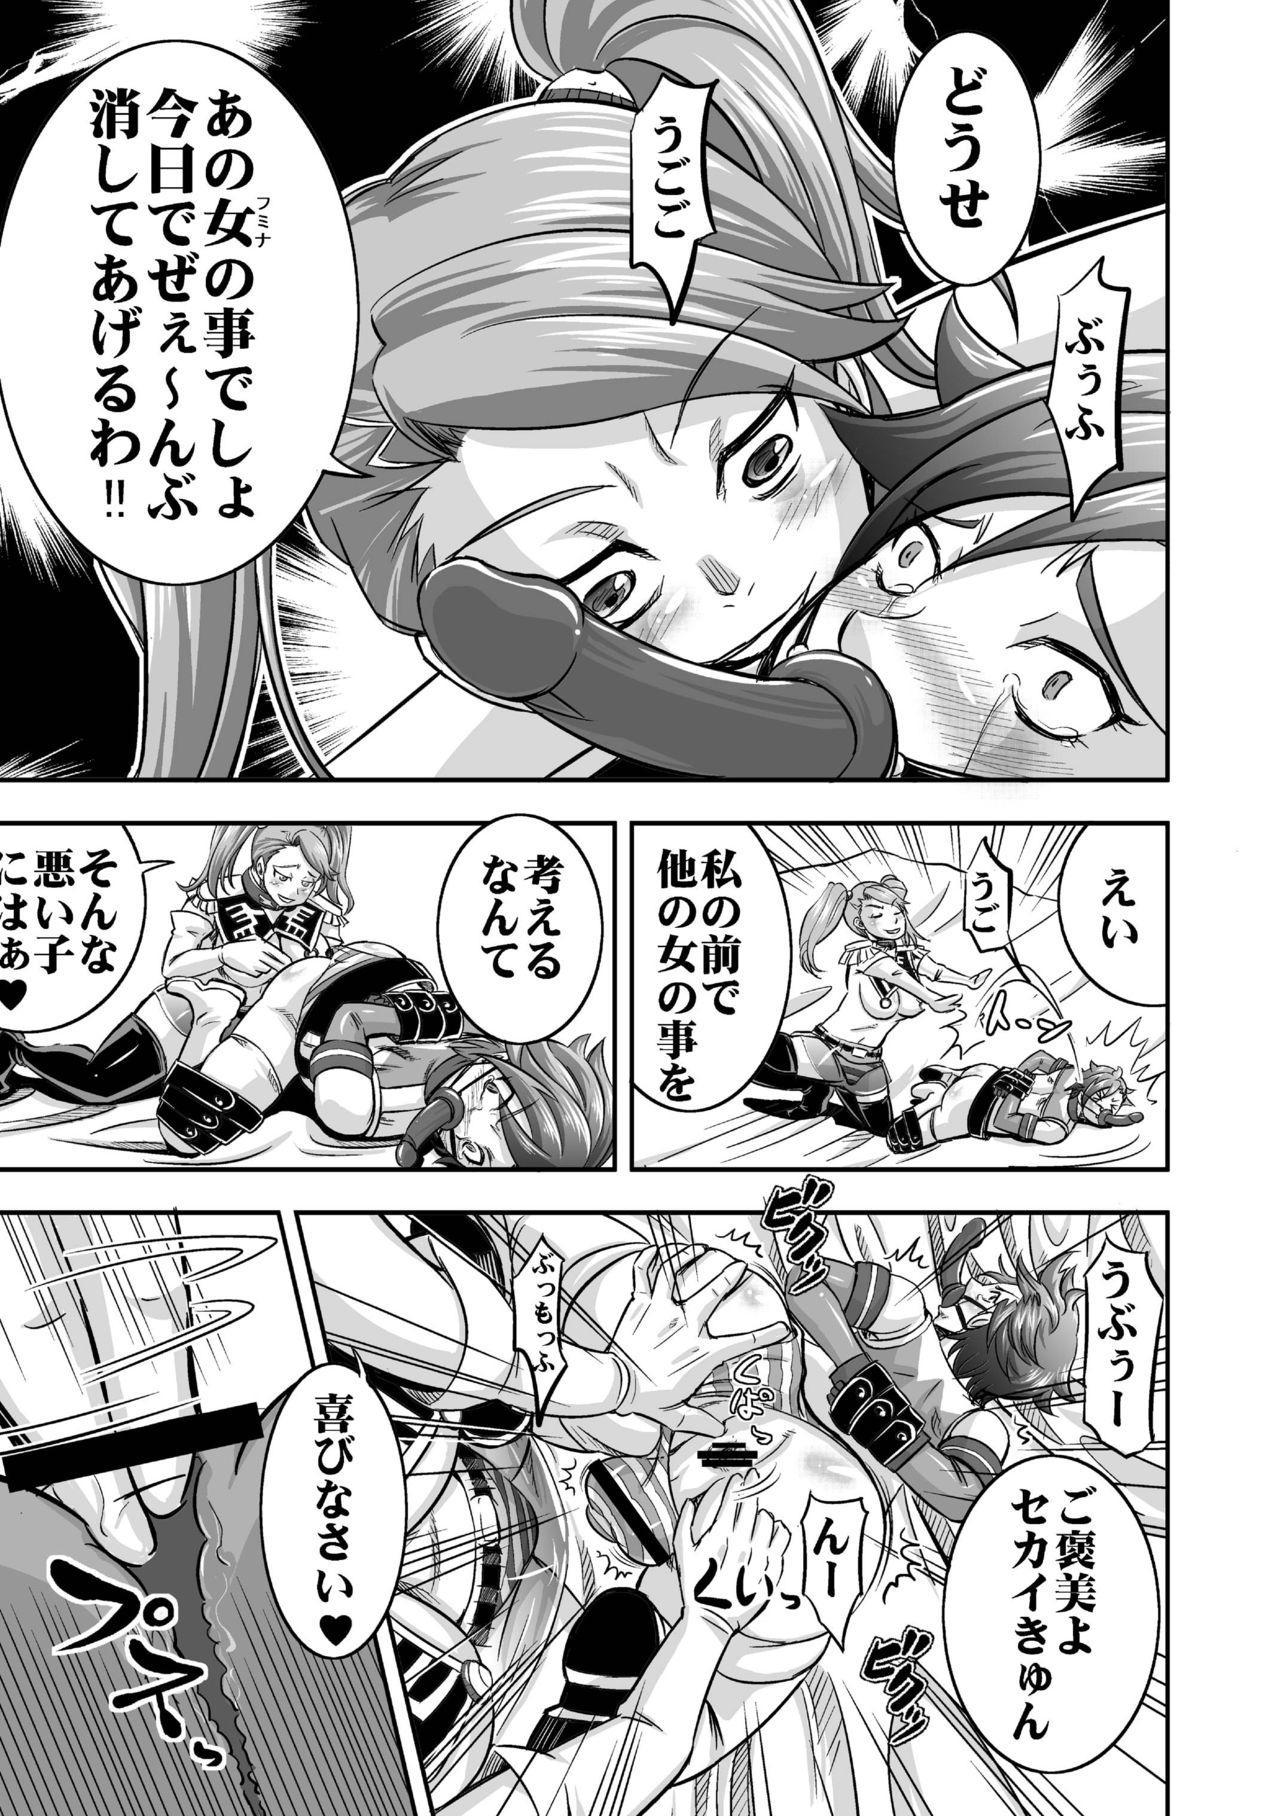 [Nisepakudo (Nisepakuman-san)] Plamo-kyou Chijo 3 -Futomashi- (Gundam Build Fighters Try) [Digital] 10